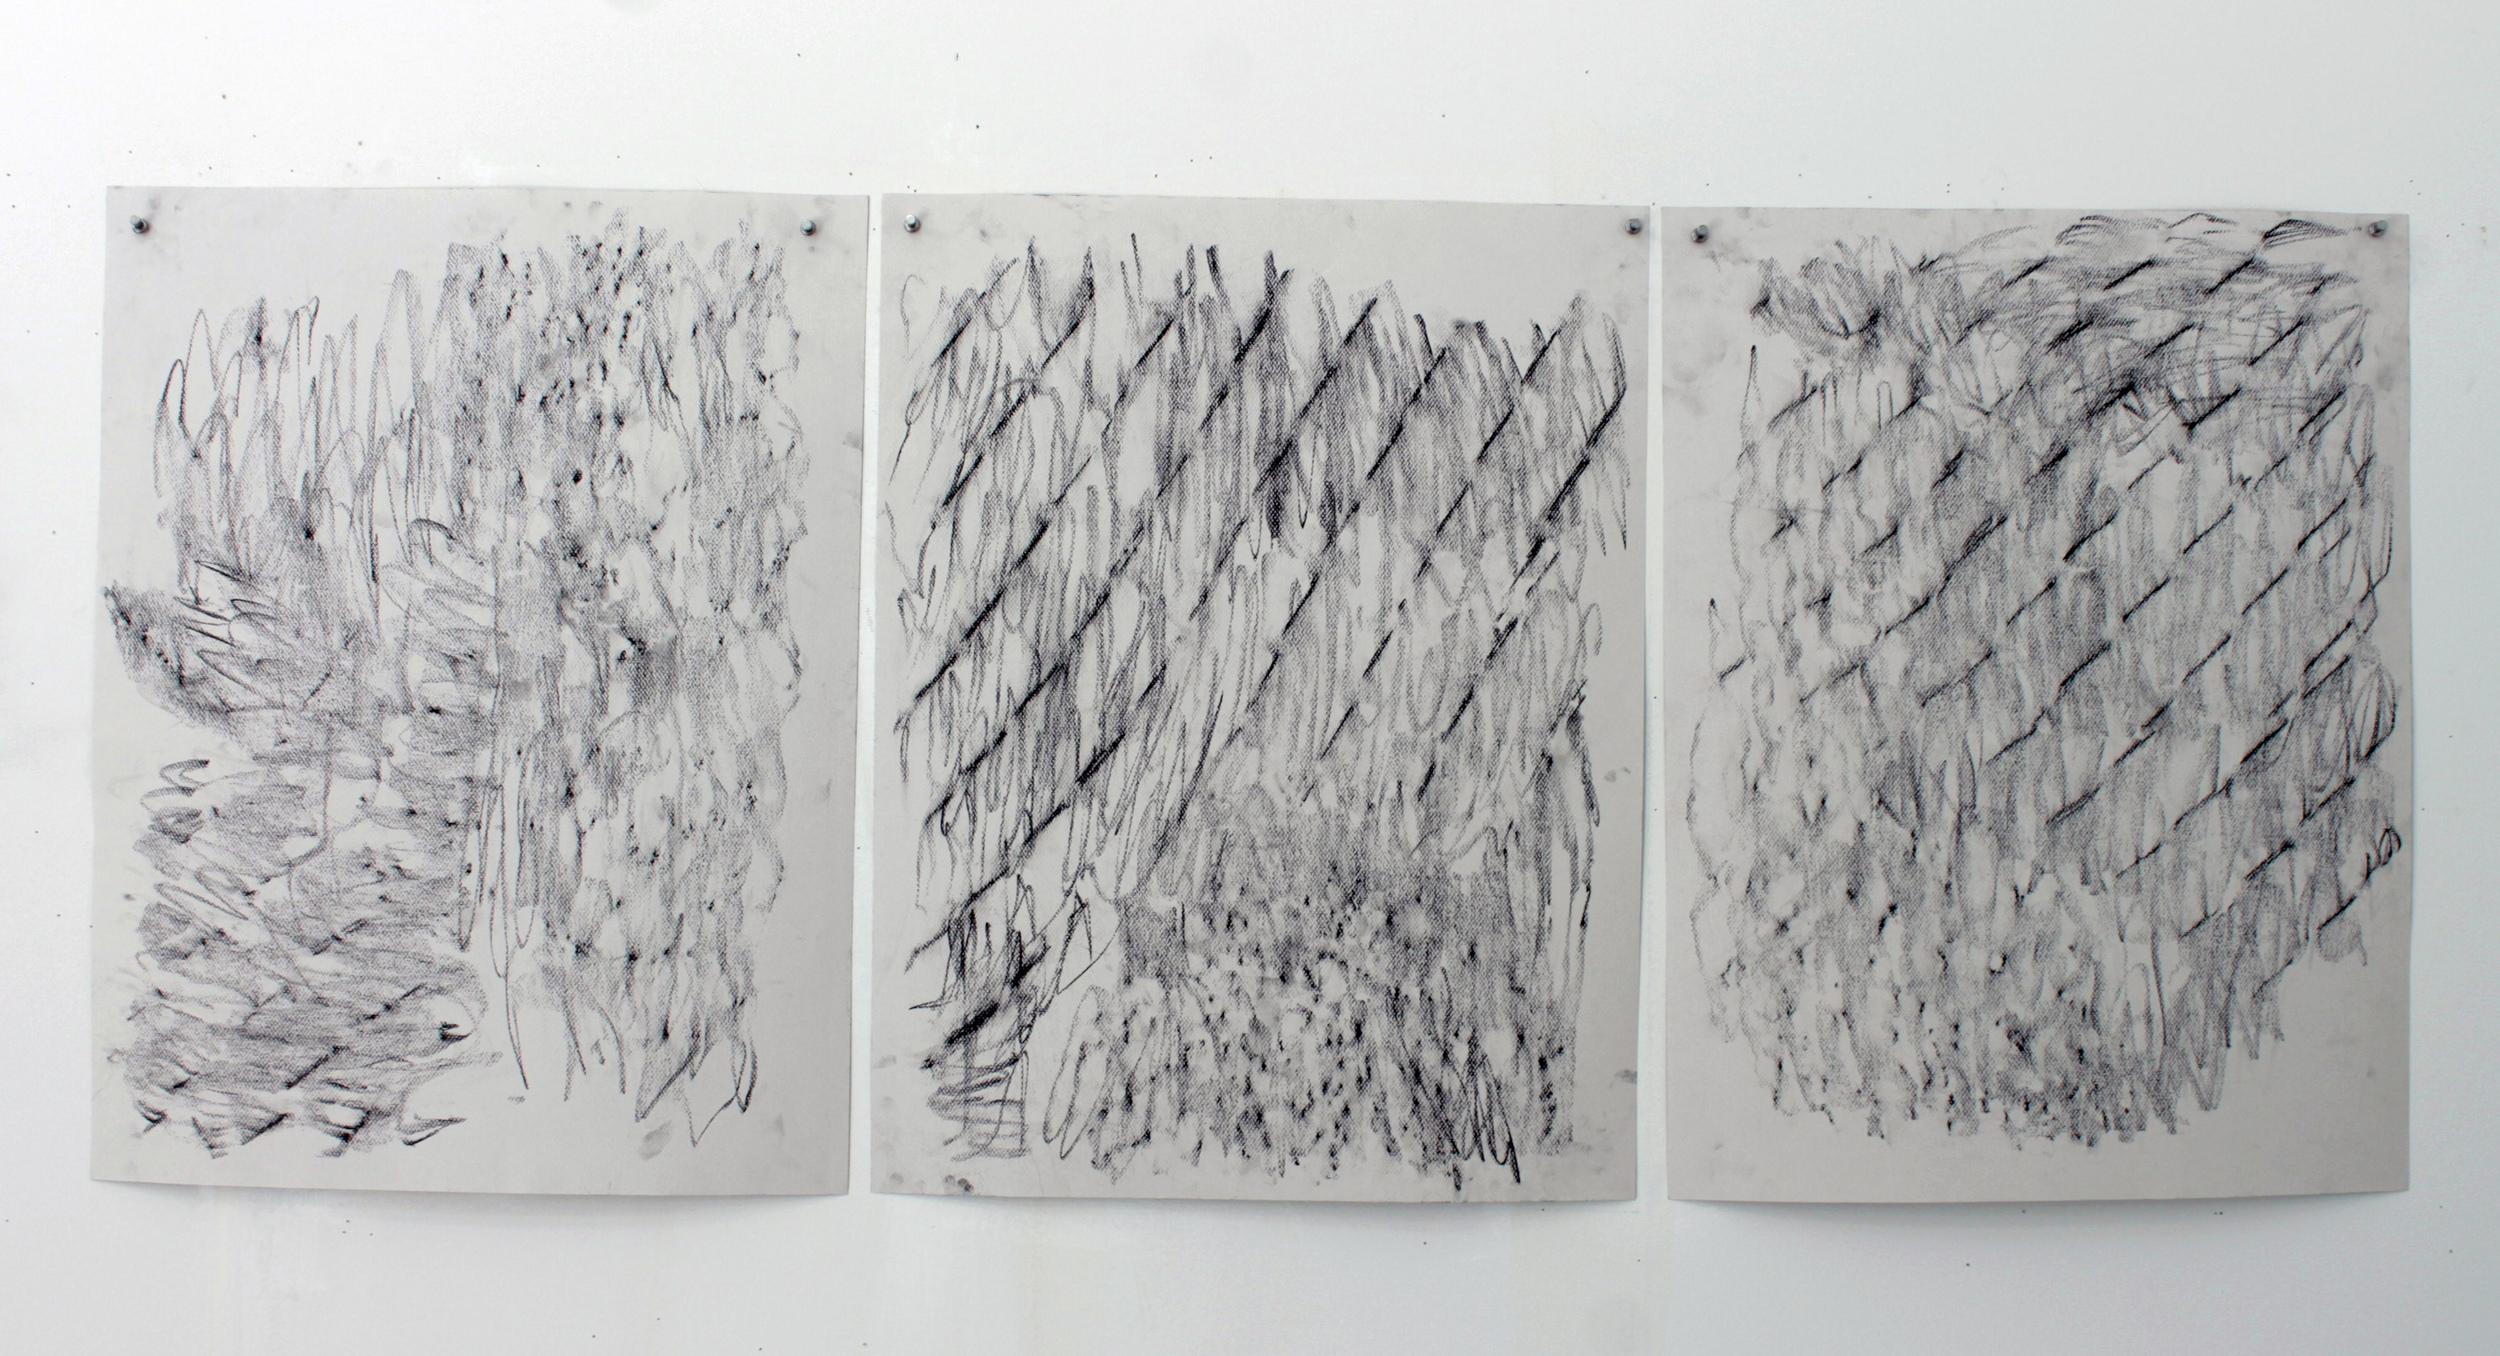 Tree Fence Impressions, 2014